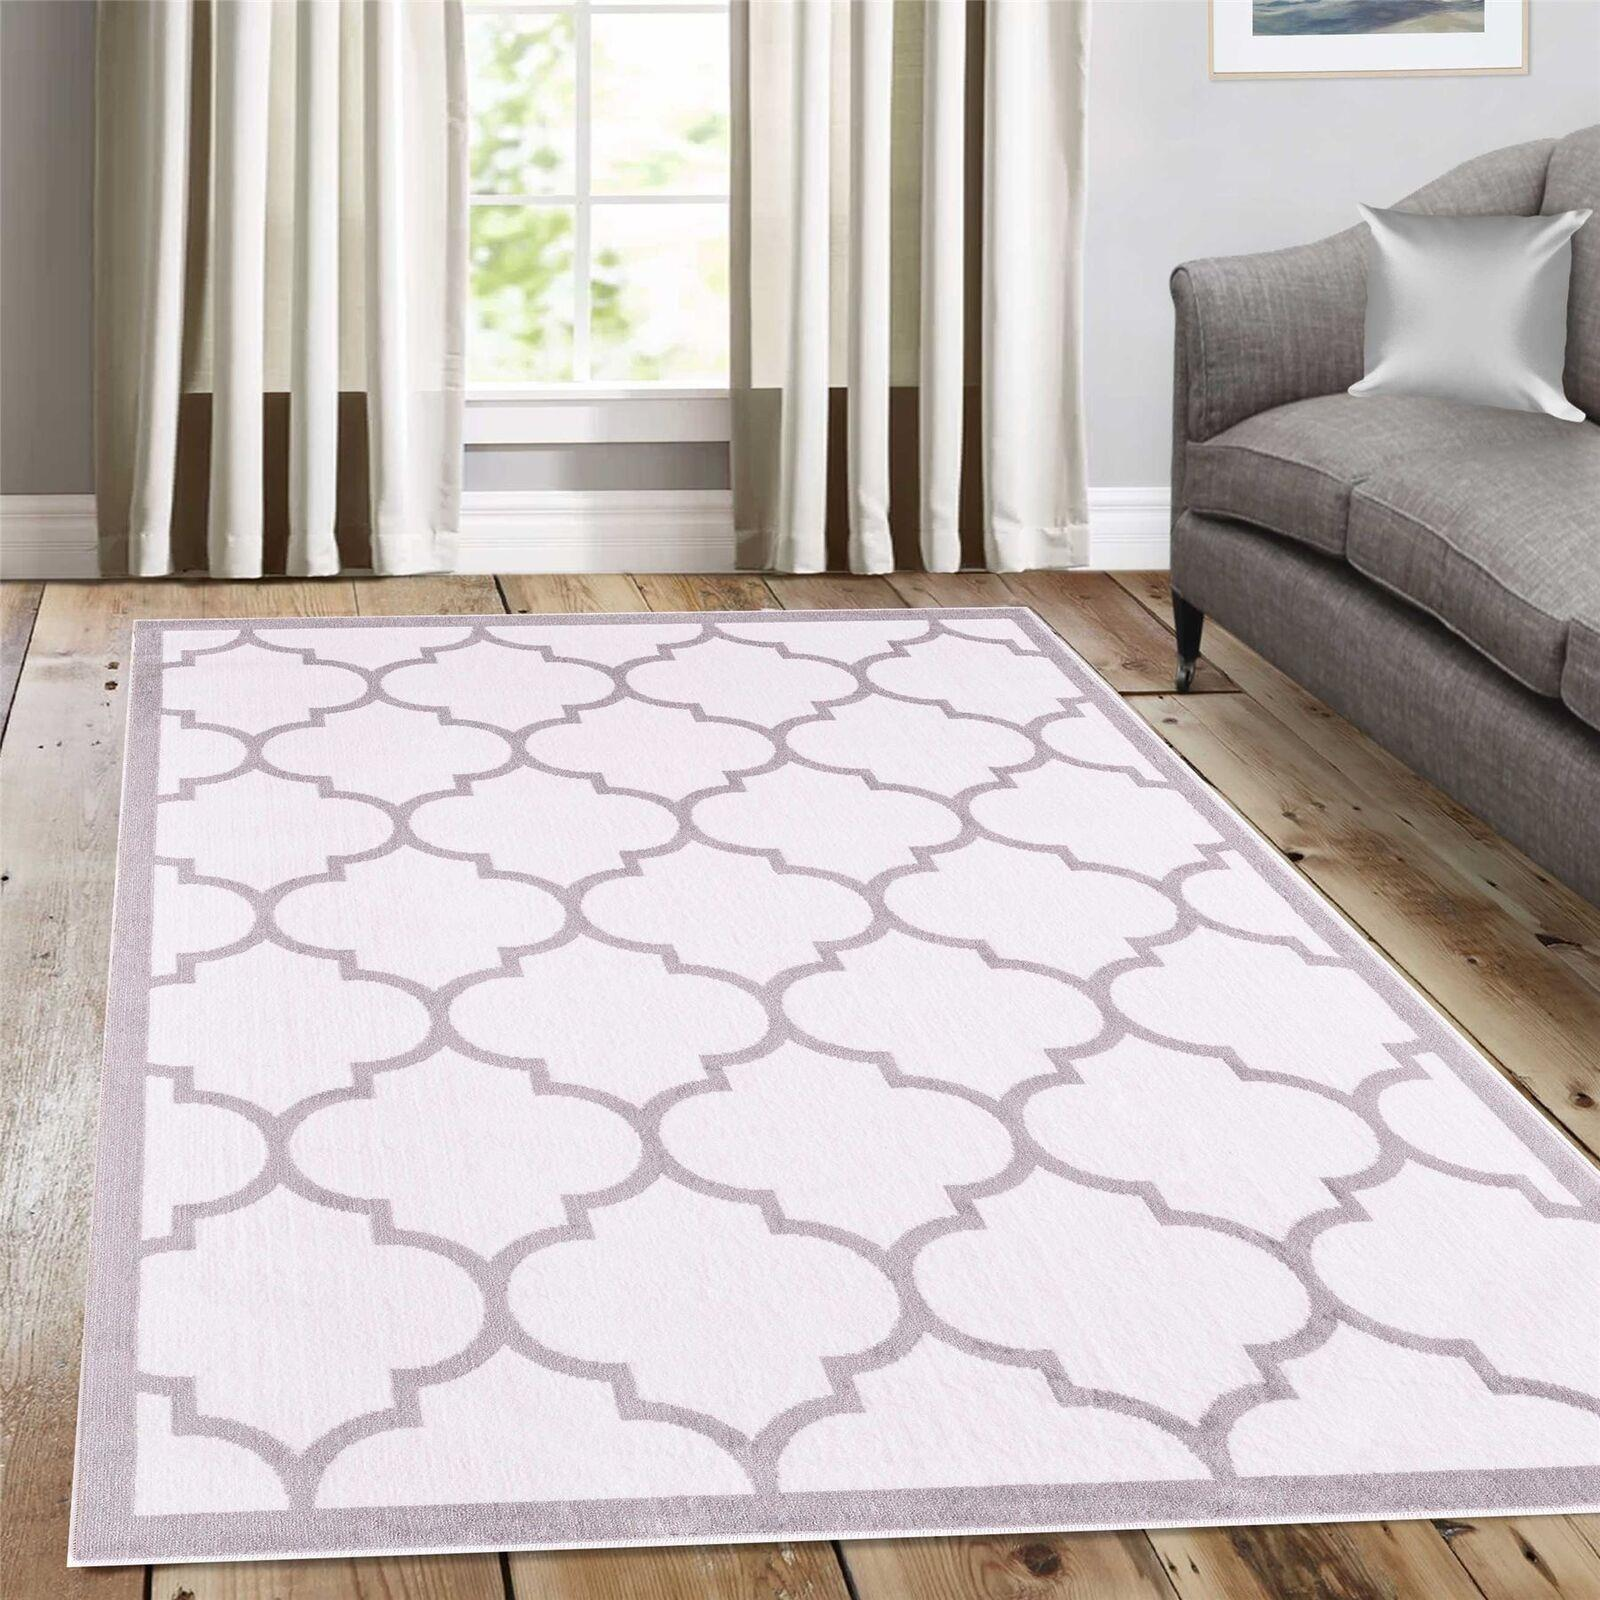 Large-Modern-Classic-Trellis-INDOOR-RUGS-Coloured-Floor-Carpet-Outdoor-Rug-Mats thumbnail 9